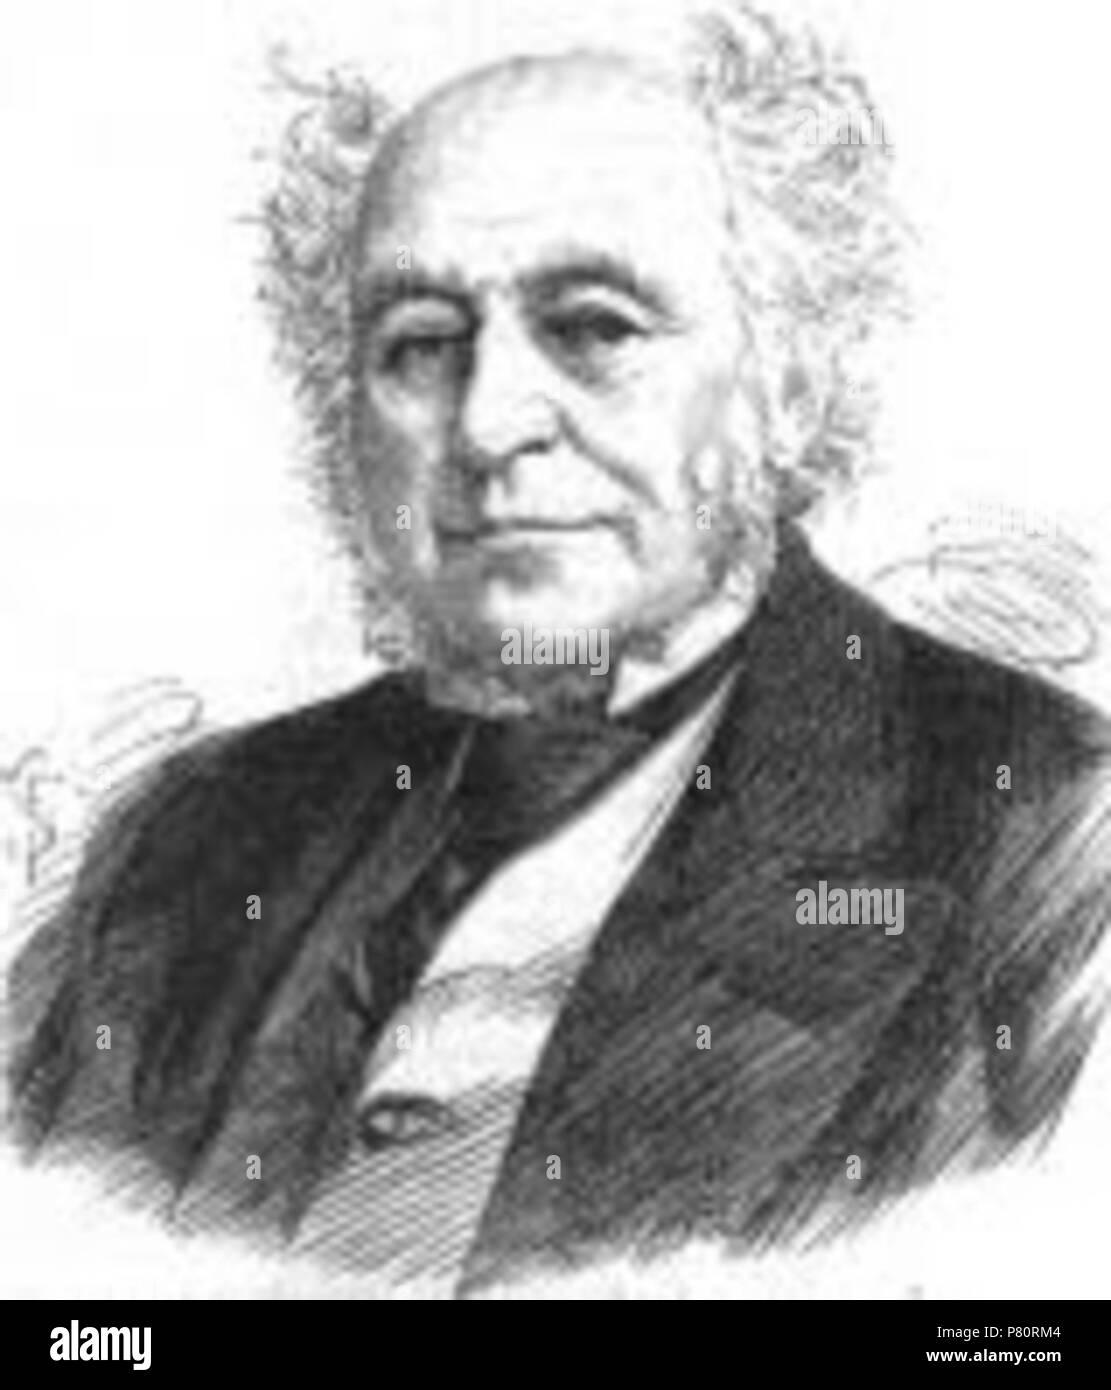 English: Portrait from the Illustrated London News of Sir Hardman Earle, 1st Baronet (1792–1877), Mayor of Liverpool. 1877 347 Sir Hardman Earle 1877 - Stock Image